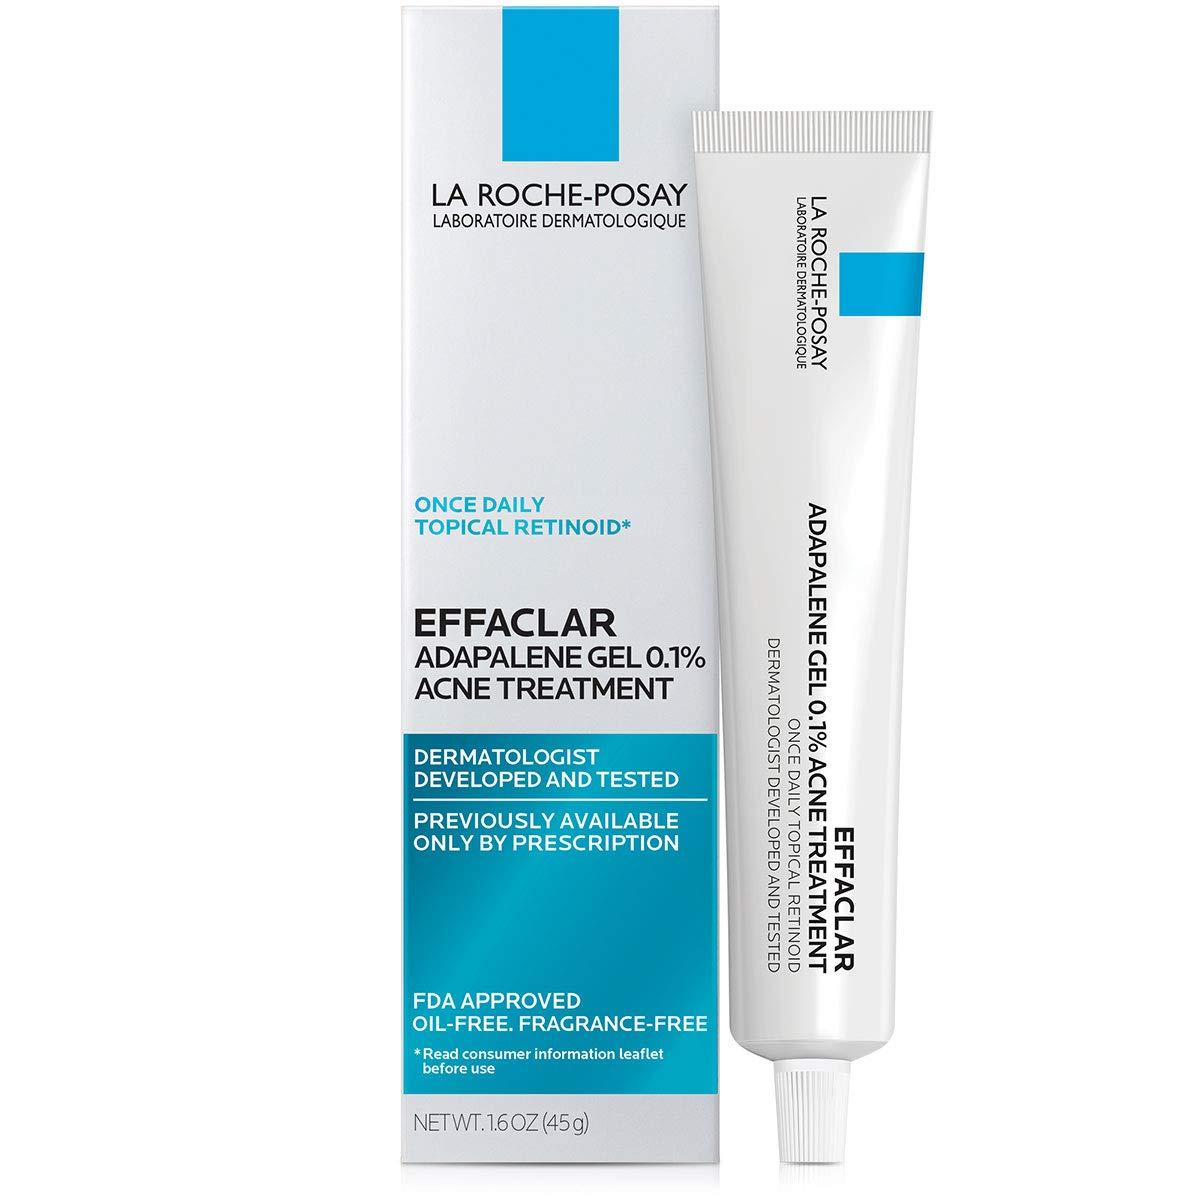 La Roche-Posay Effaclar Adapalene Gel 0.1% Acne Treatment, Prescription-Strength Topical Retinoid For Face, 1.6 Oz.